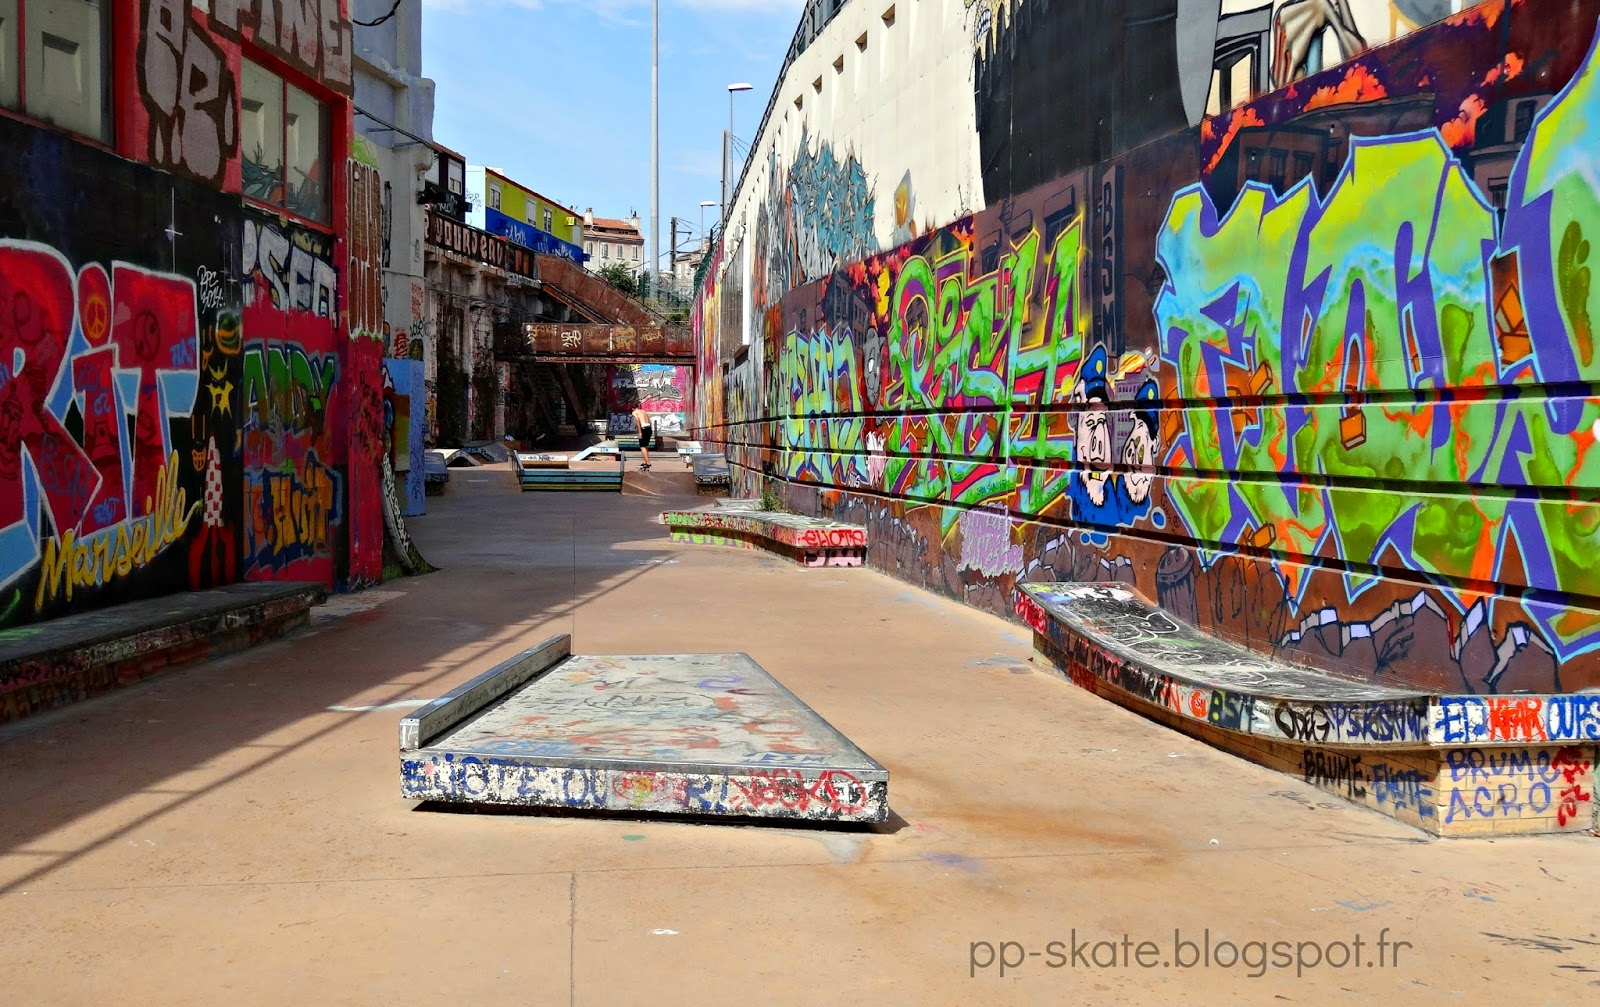 Skatepark la friche belle de mai